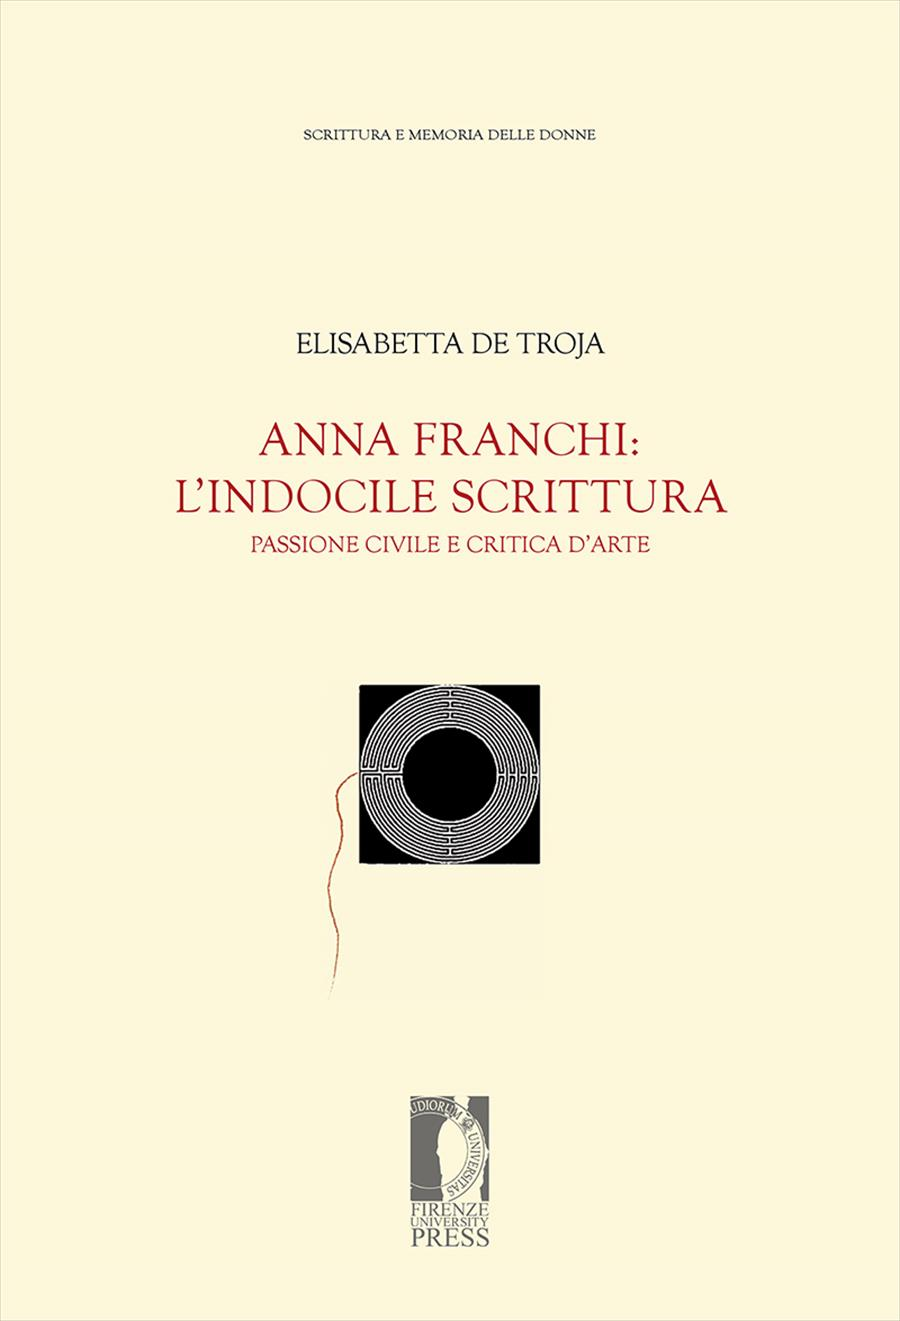 Anna Franchi: l'indocile scrittura